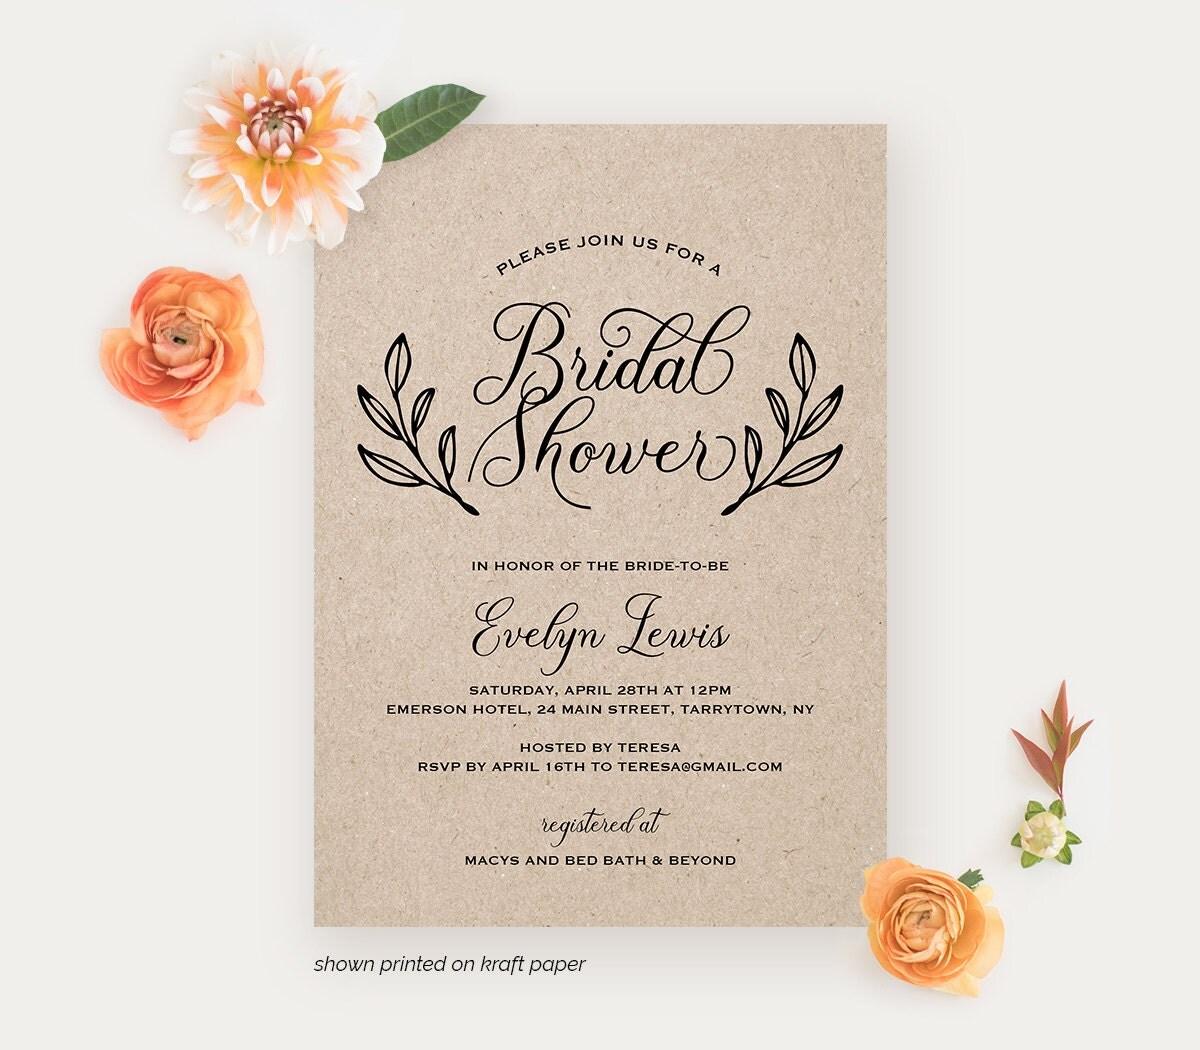 Bridal shower invitation printable wedding shower invite for Invitations for bridal showers